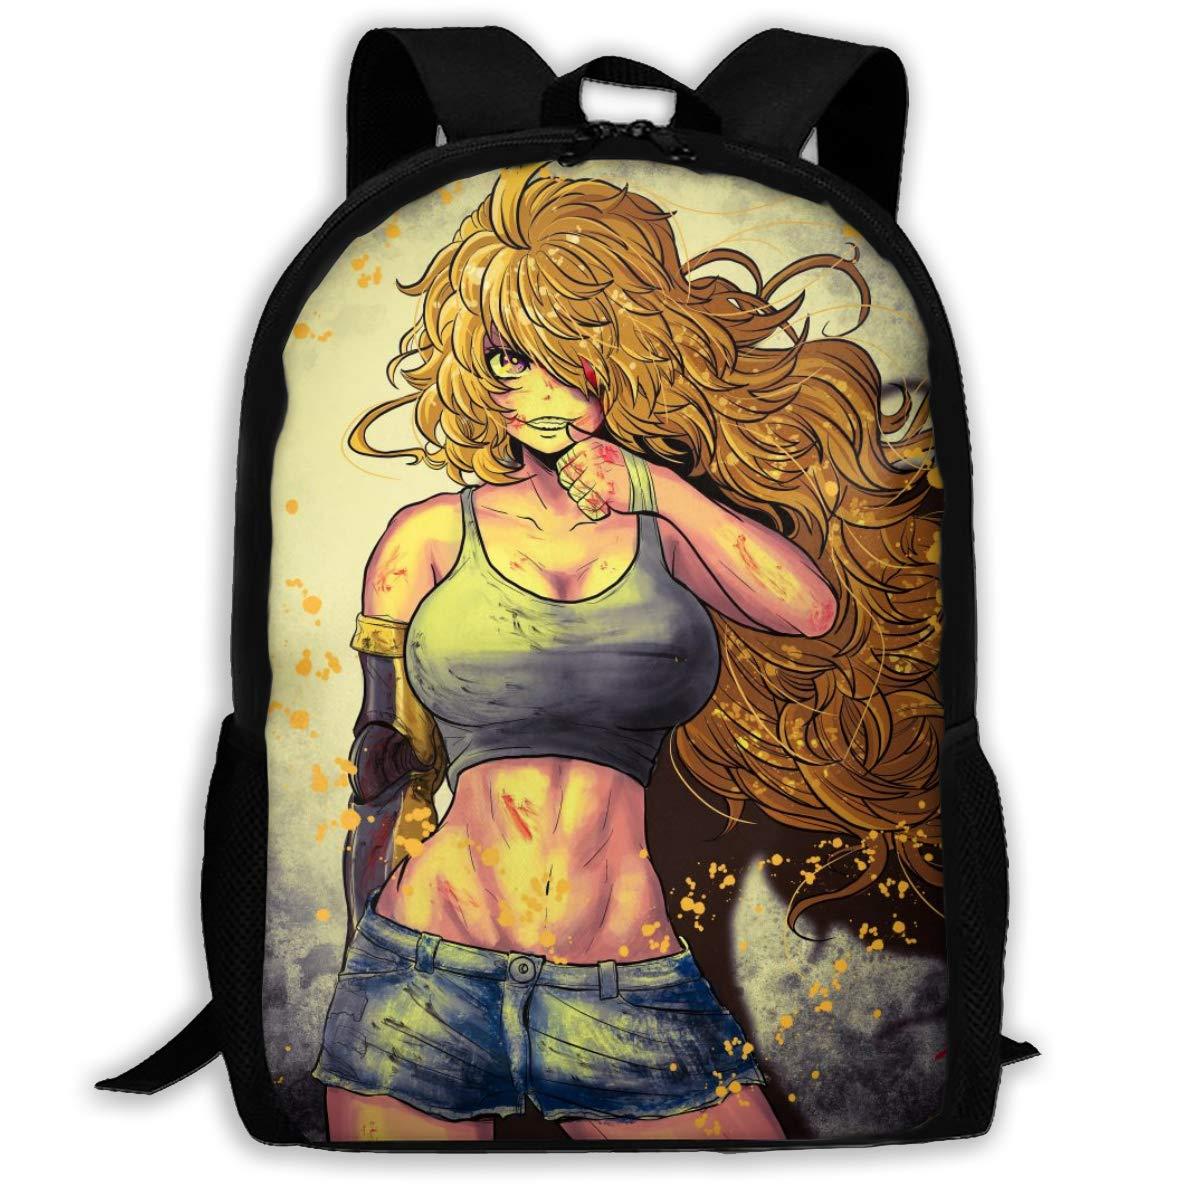 Amazoncom Travel Laptop Backpack Lightweight Waterproof